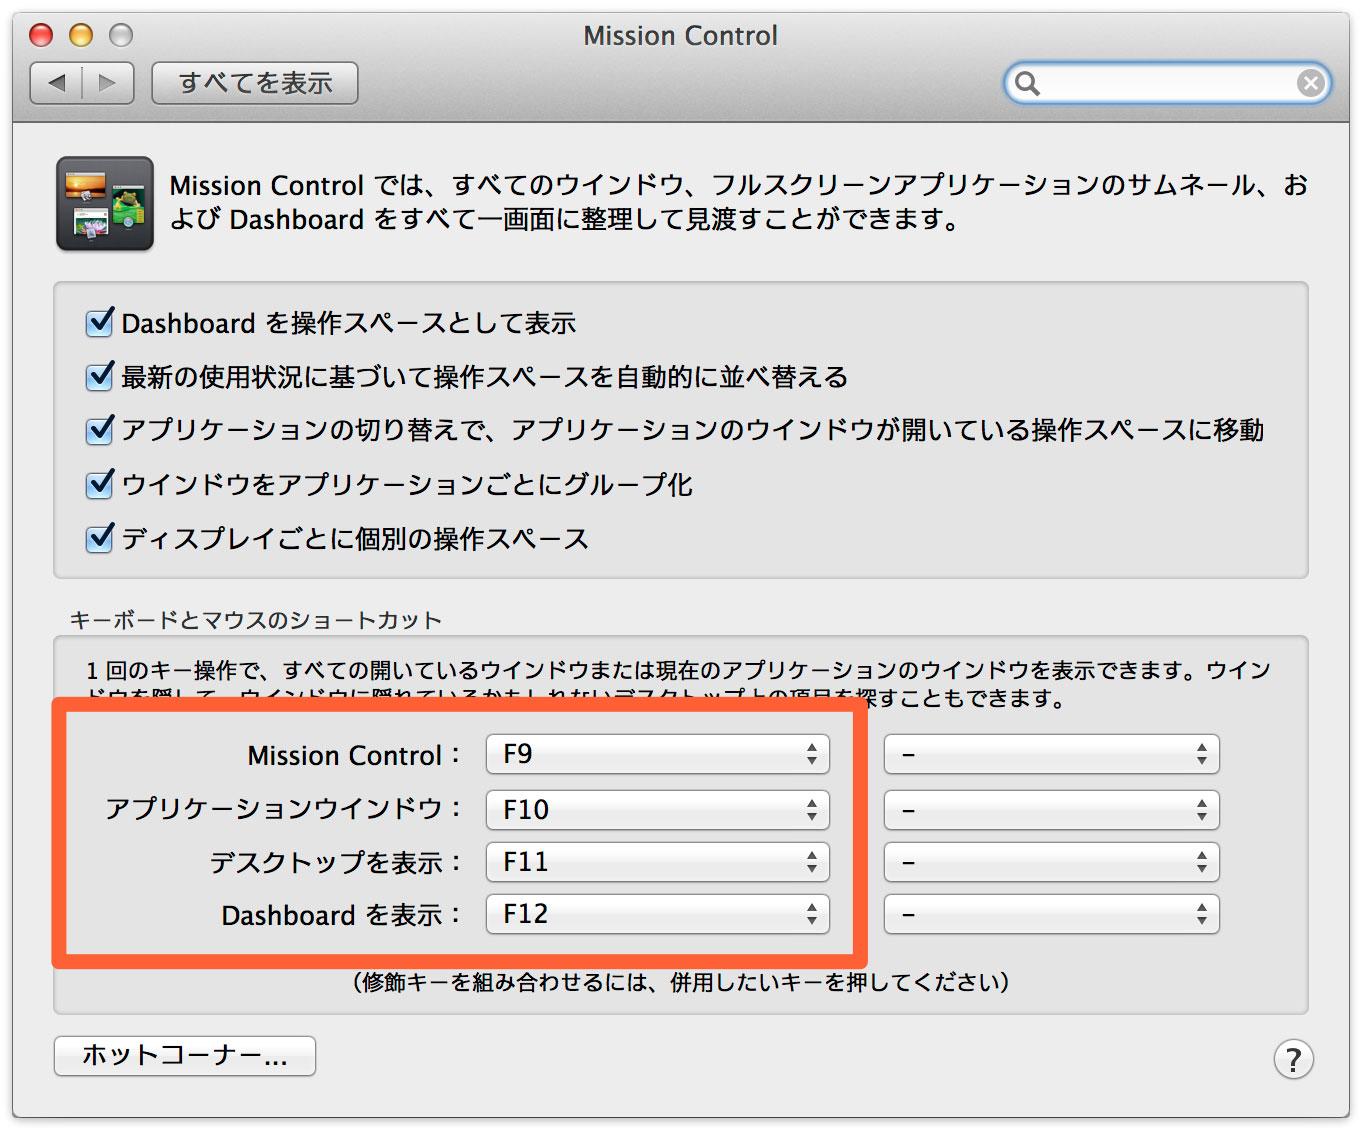 mission-control-shortcut-s.jpg